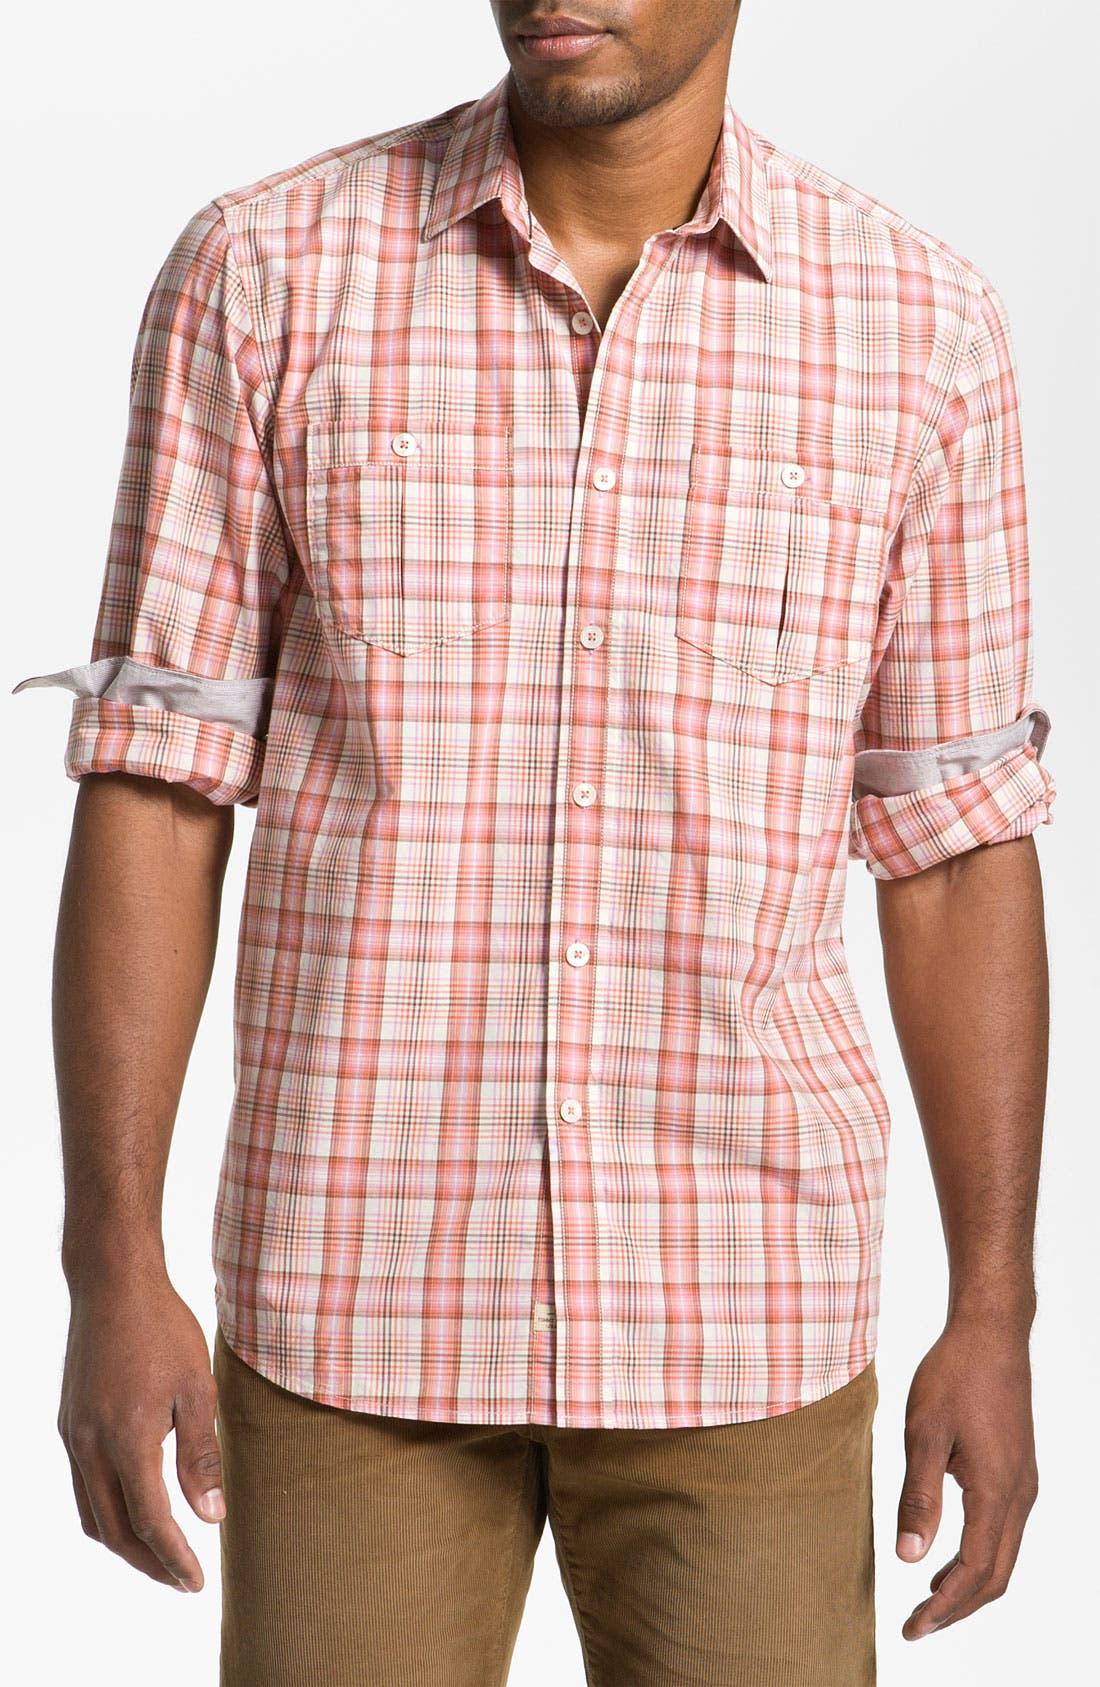 Alternate Image 1 Selected - Tommy Bahama Denim 'Peachy Plaid' Sport Shirt